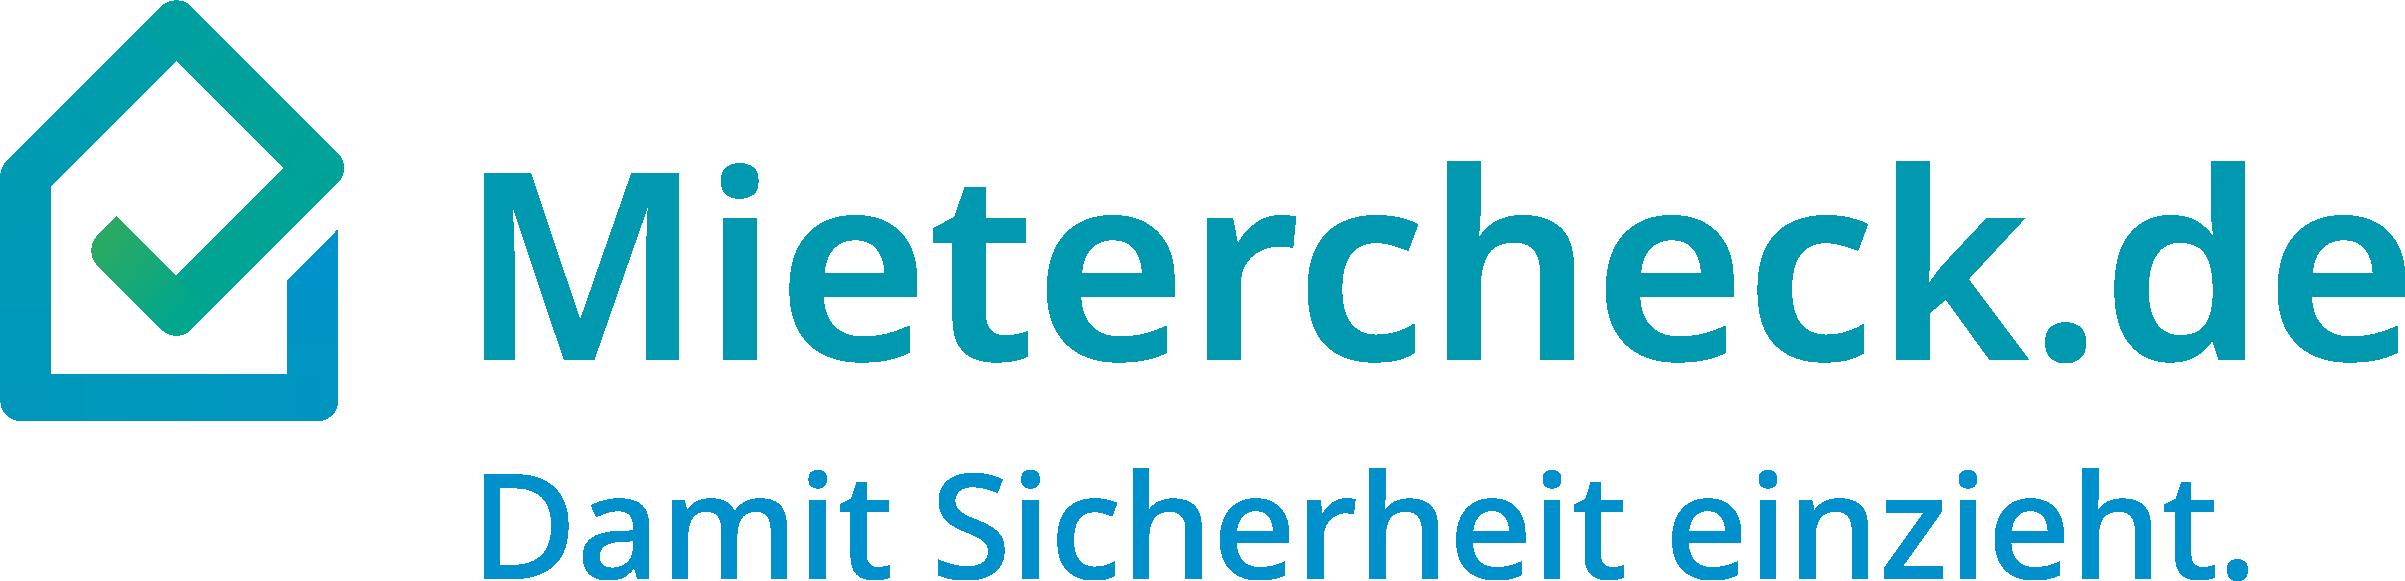 Mietercheck_Logo_mit_Claim_RGB_300ppi